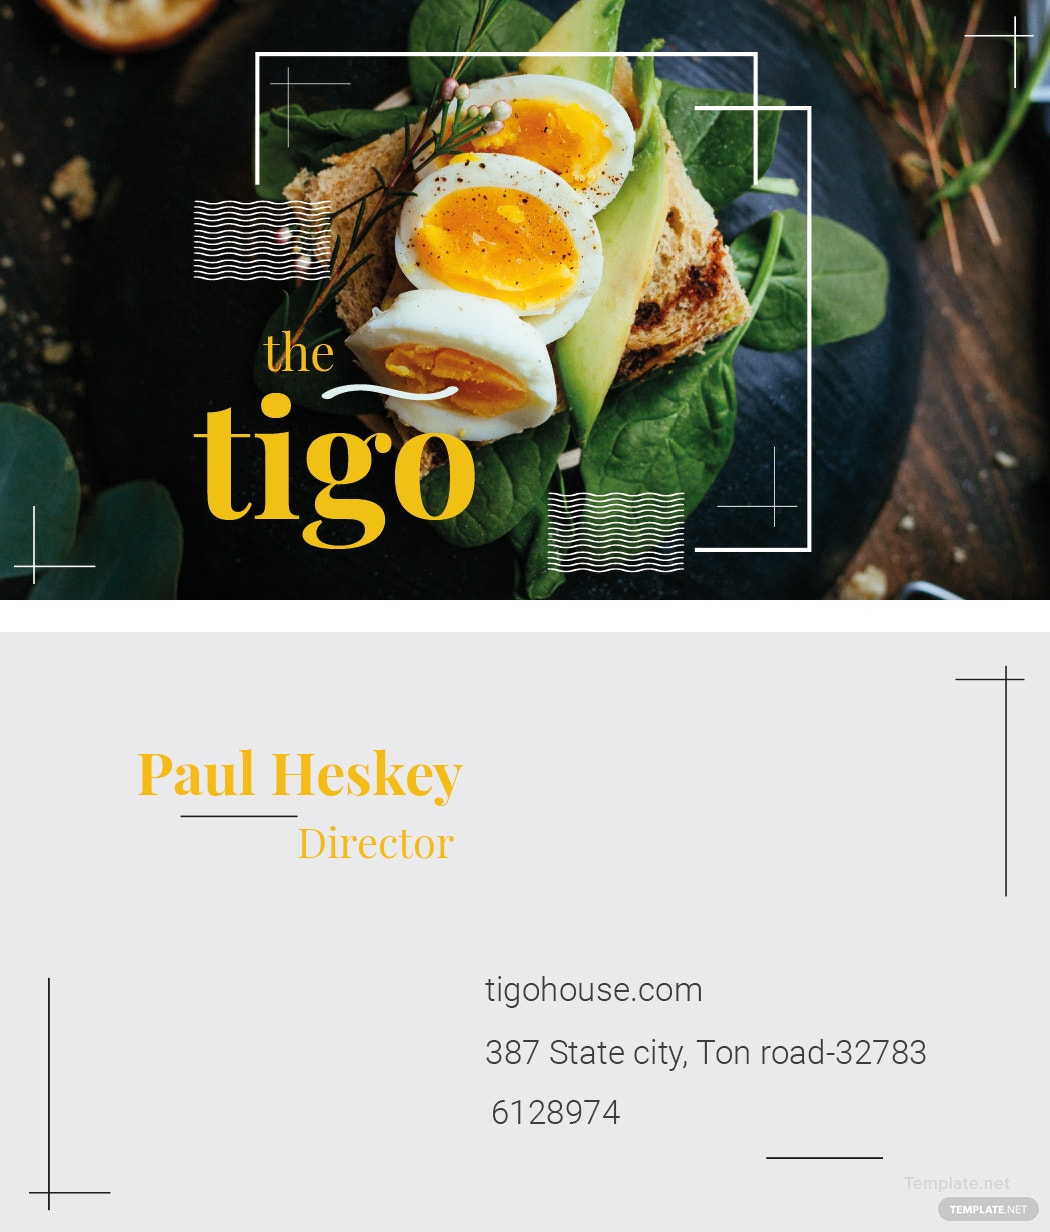 Free Restaurant Business Card Template in Adobe Illustrator ...